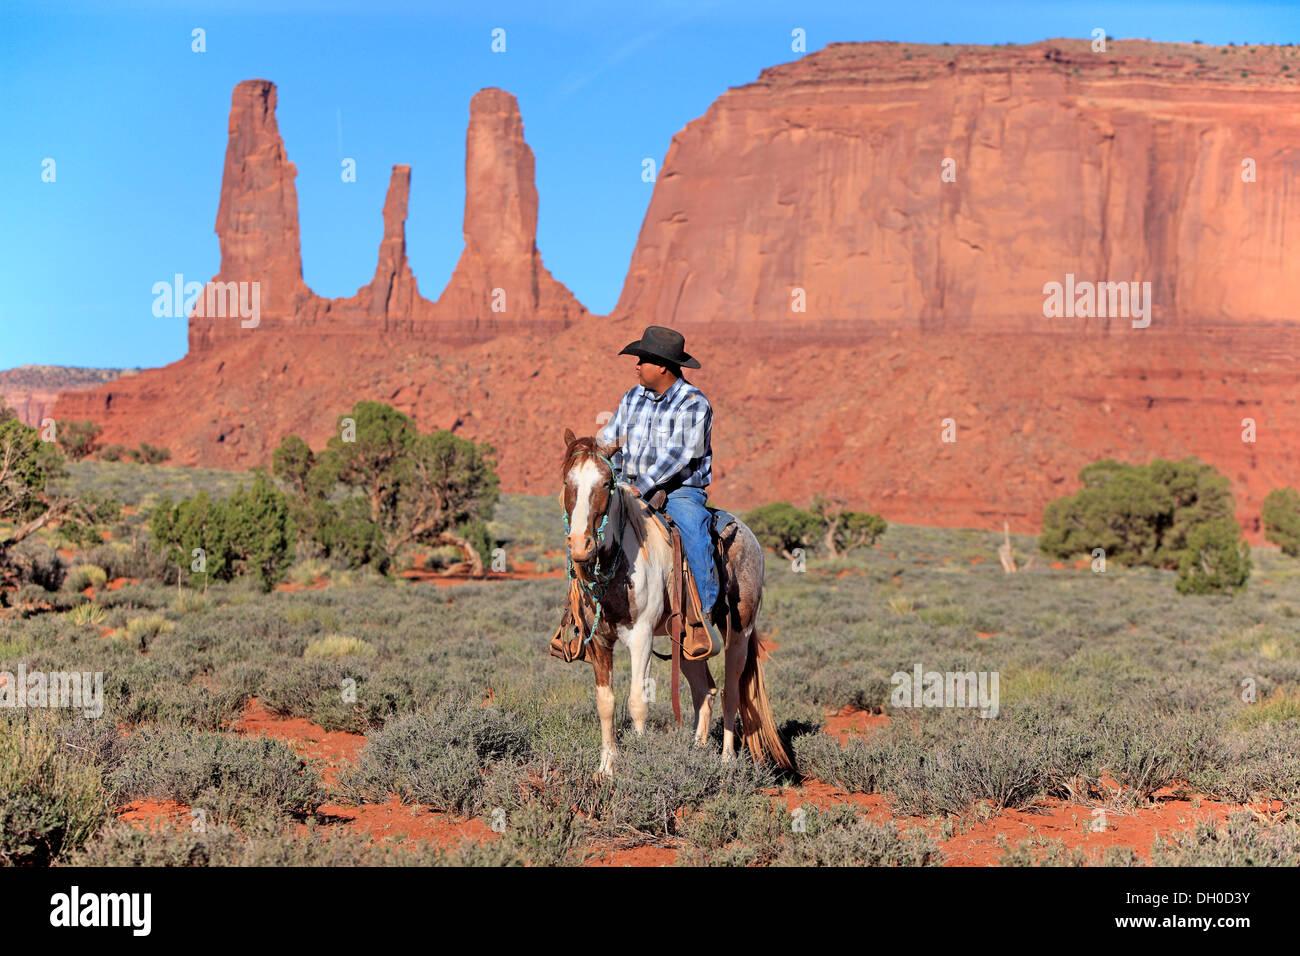 Utah Cowboy Stock Photos Amp Utah Cowboy Stock Images Alamy